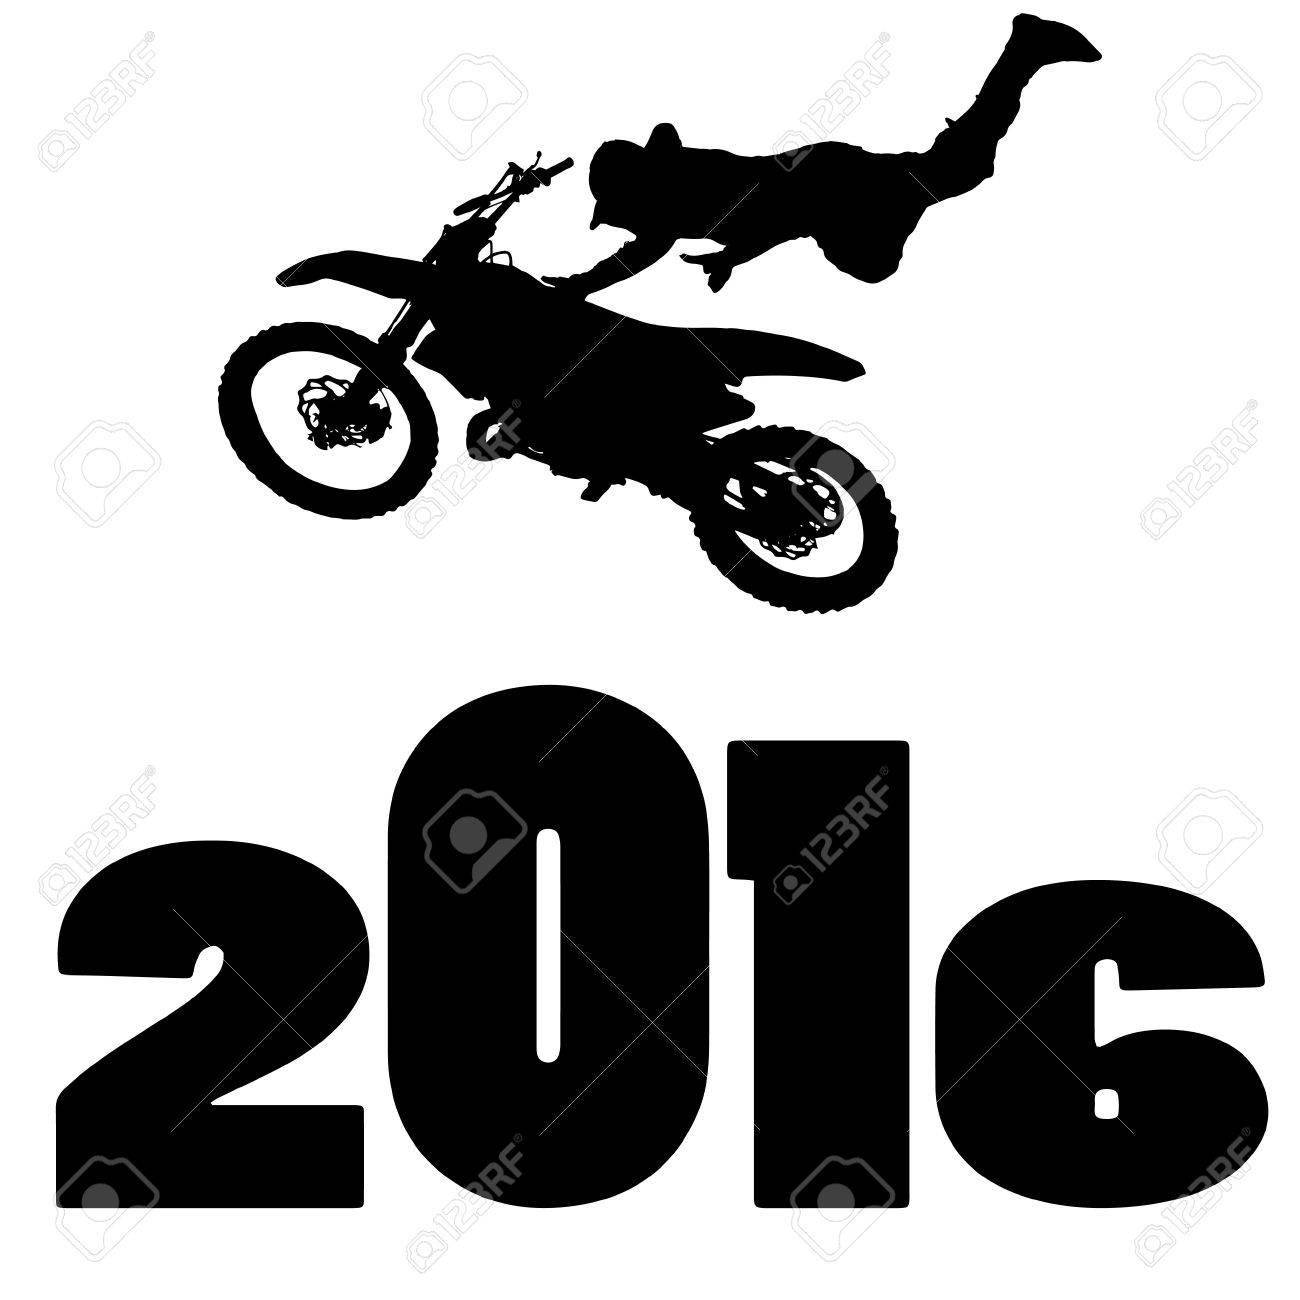 black silhouette vector illustration 2016 New Year - 46204289